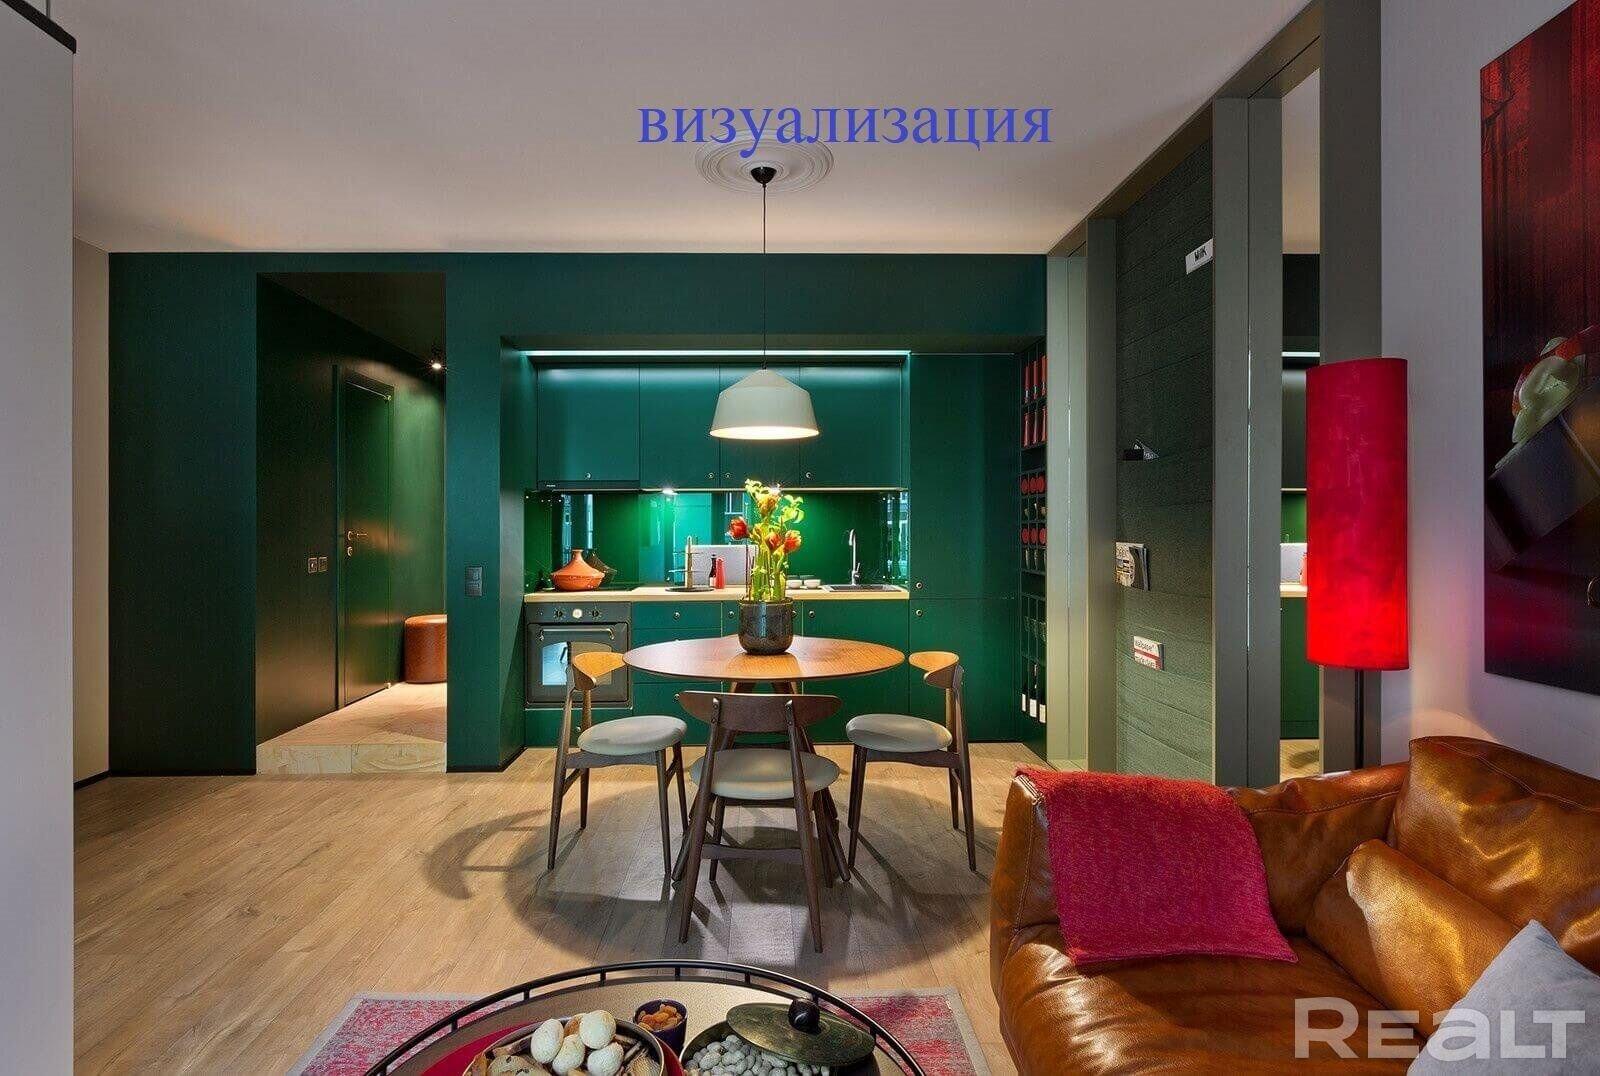 Продажа 2х комнатной квартиры, г. Минск, ул. Вильямса, 9, р-н Минск Мир (Minsk World)